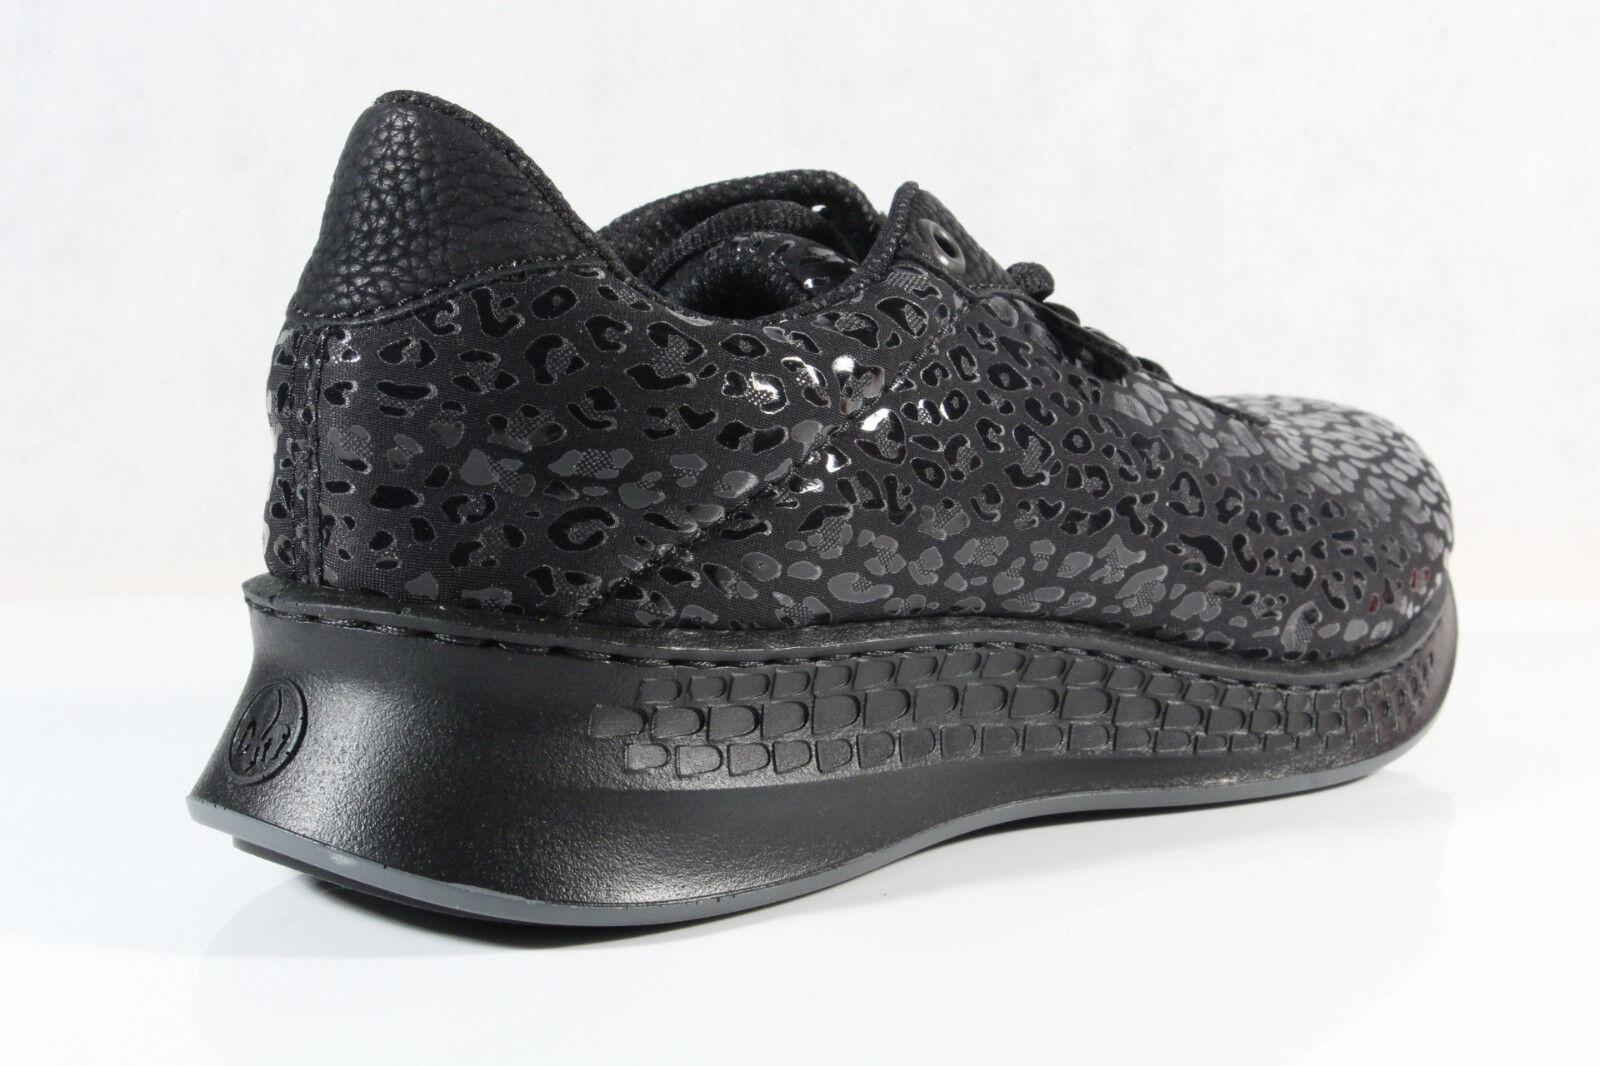 Rieker Damen Schnürschuhe Halbschuhe Sneakers Schnürschuh schwarz N5609 NEU!